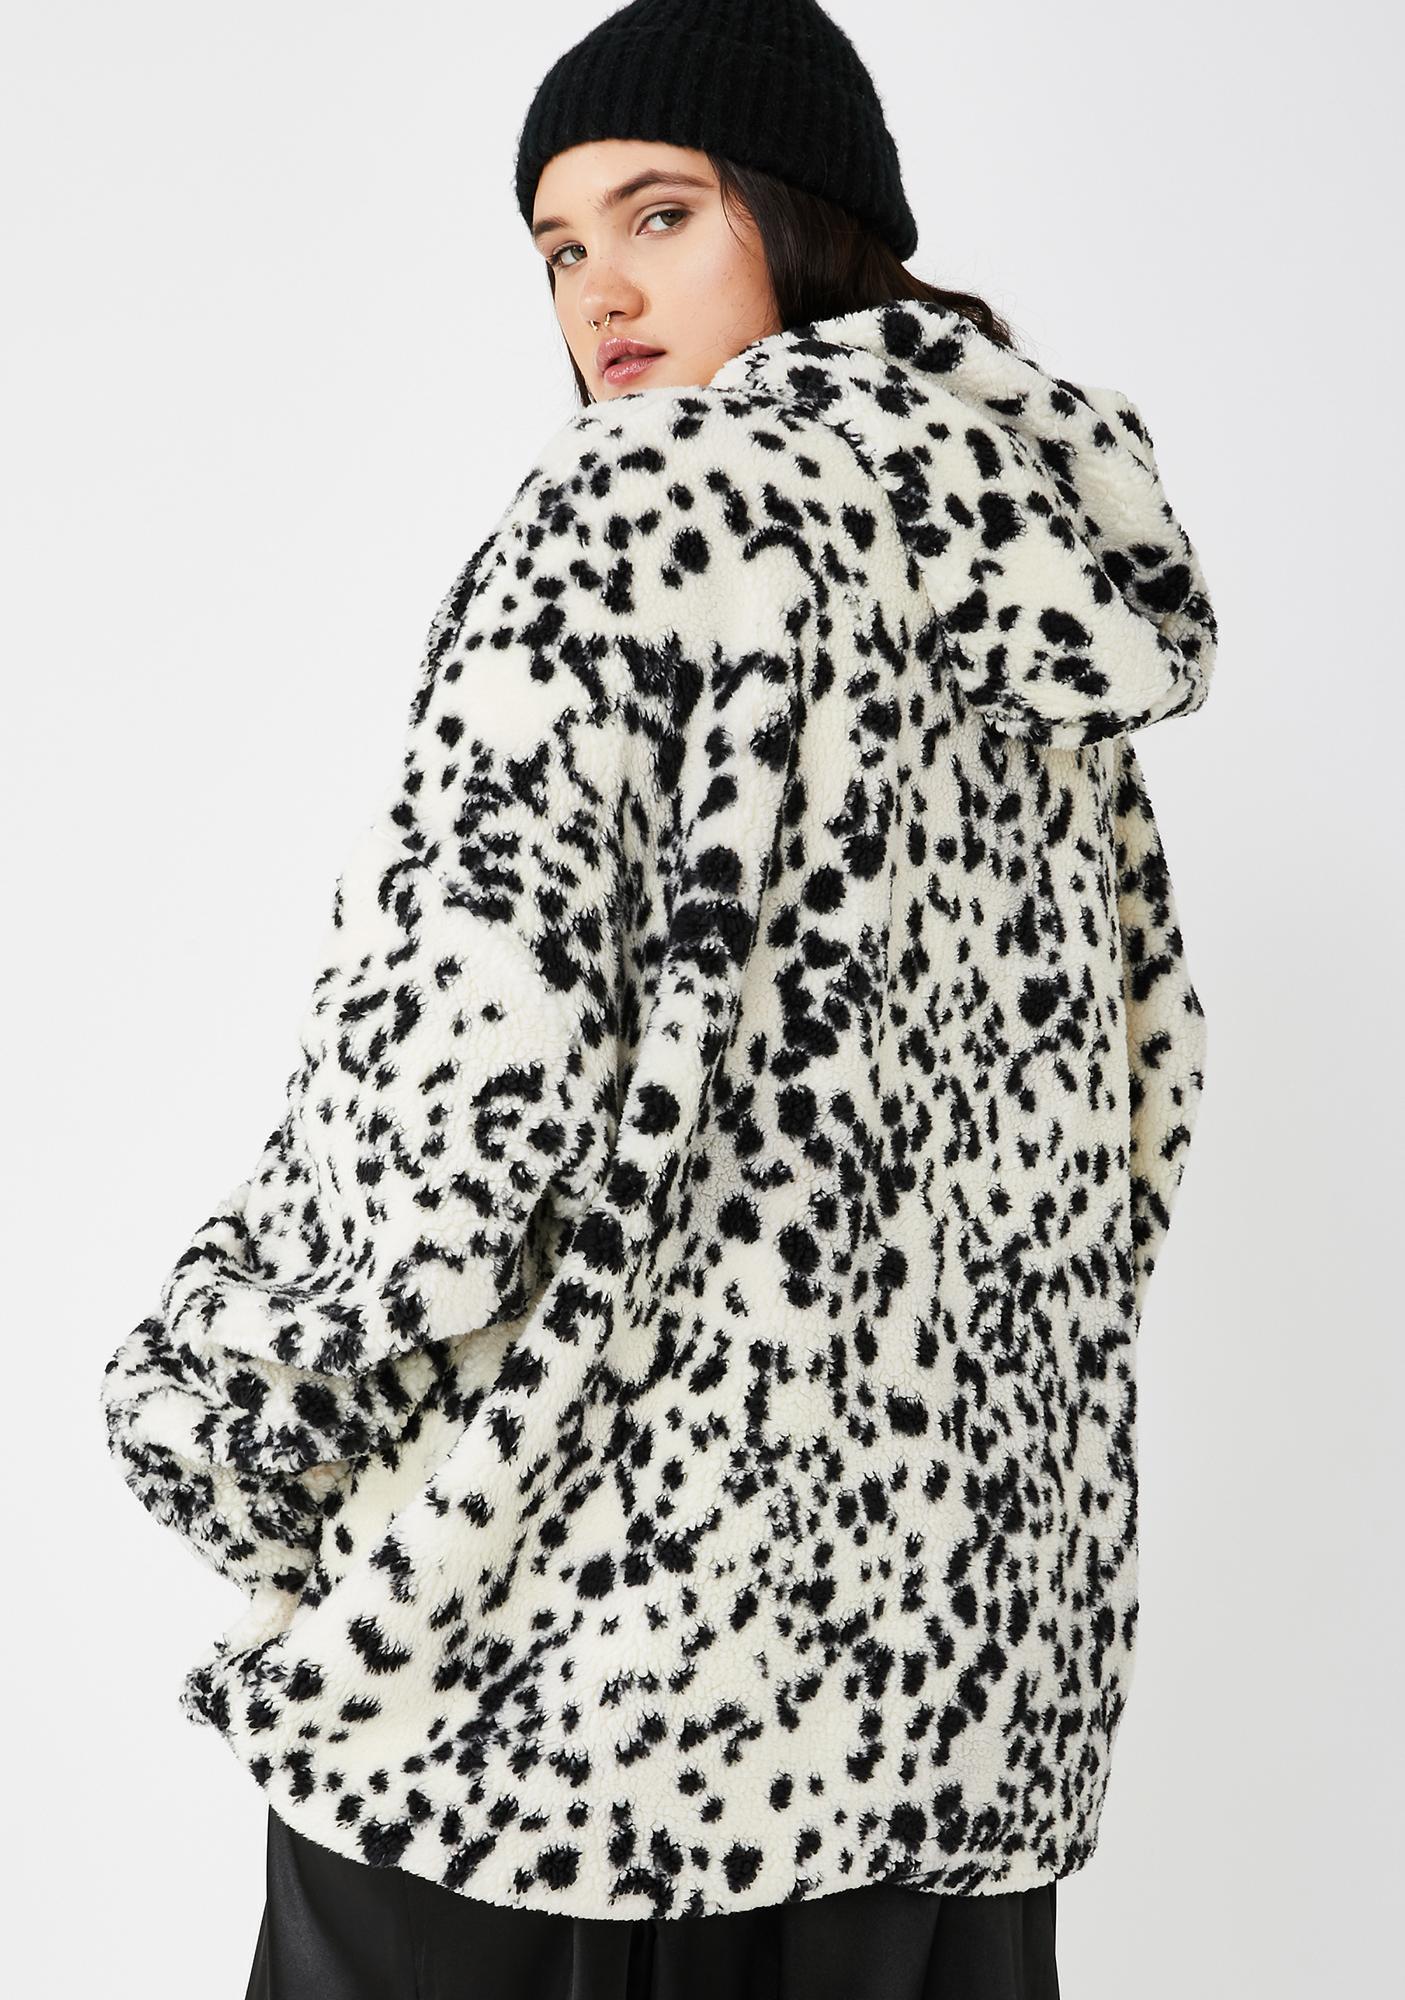 NEW GIRL ORDER Plus Dalmatian Teddy Jacket